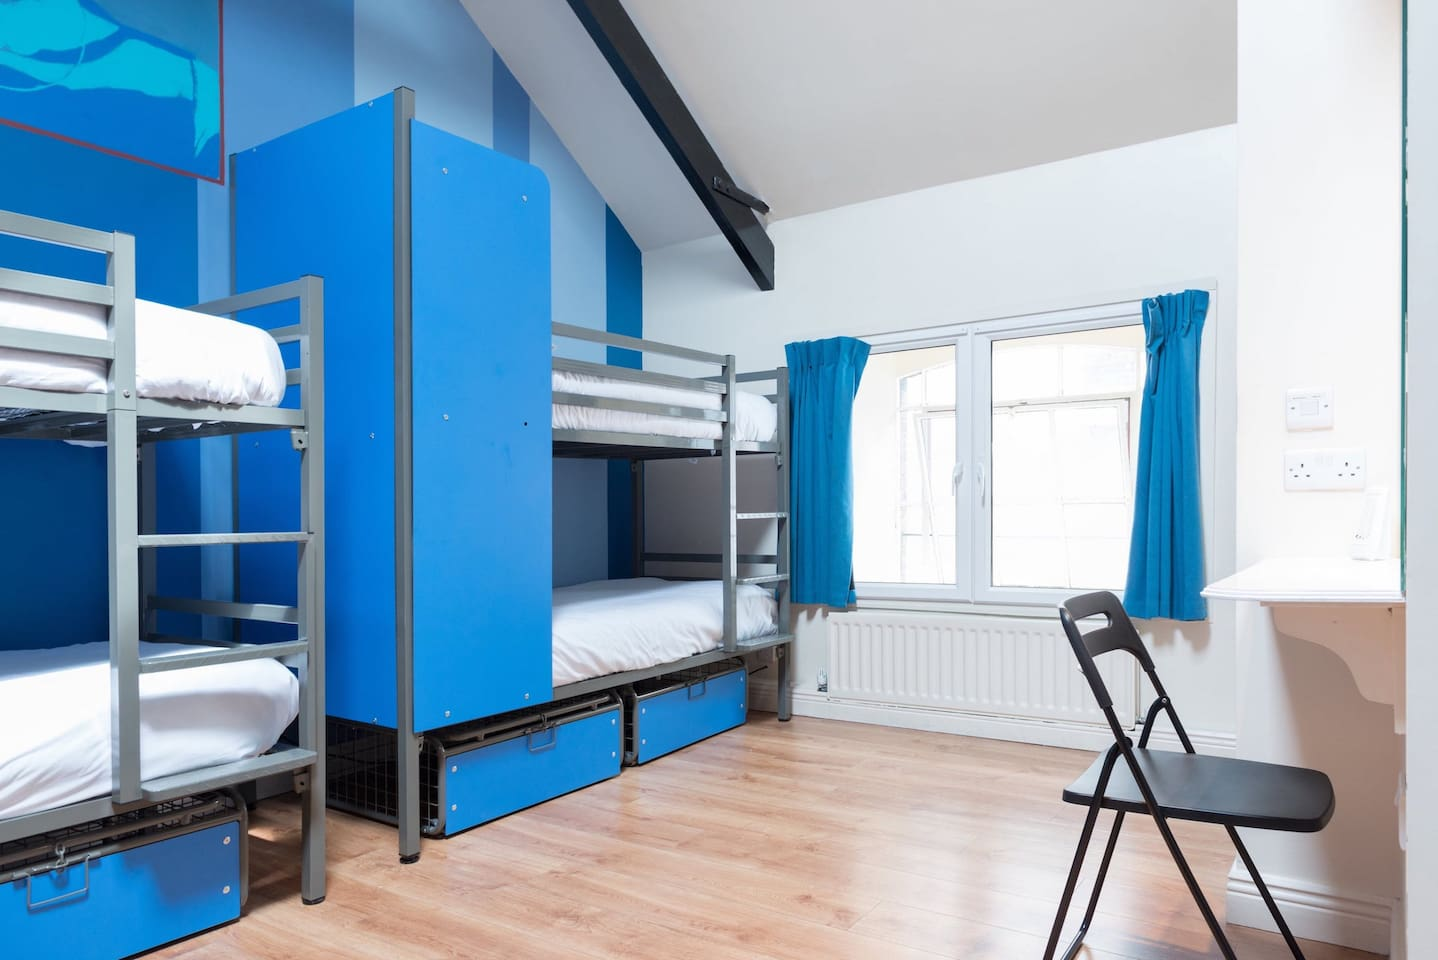 Sky Backpackers - Boutique Hostel (Bed in 6 Bed Dorm Ensuite)